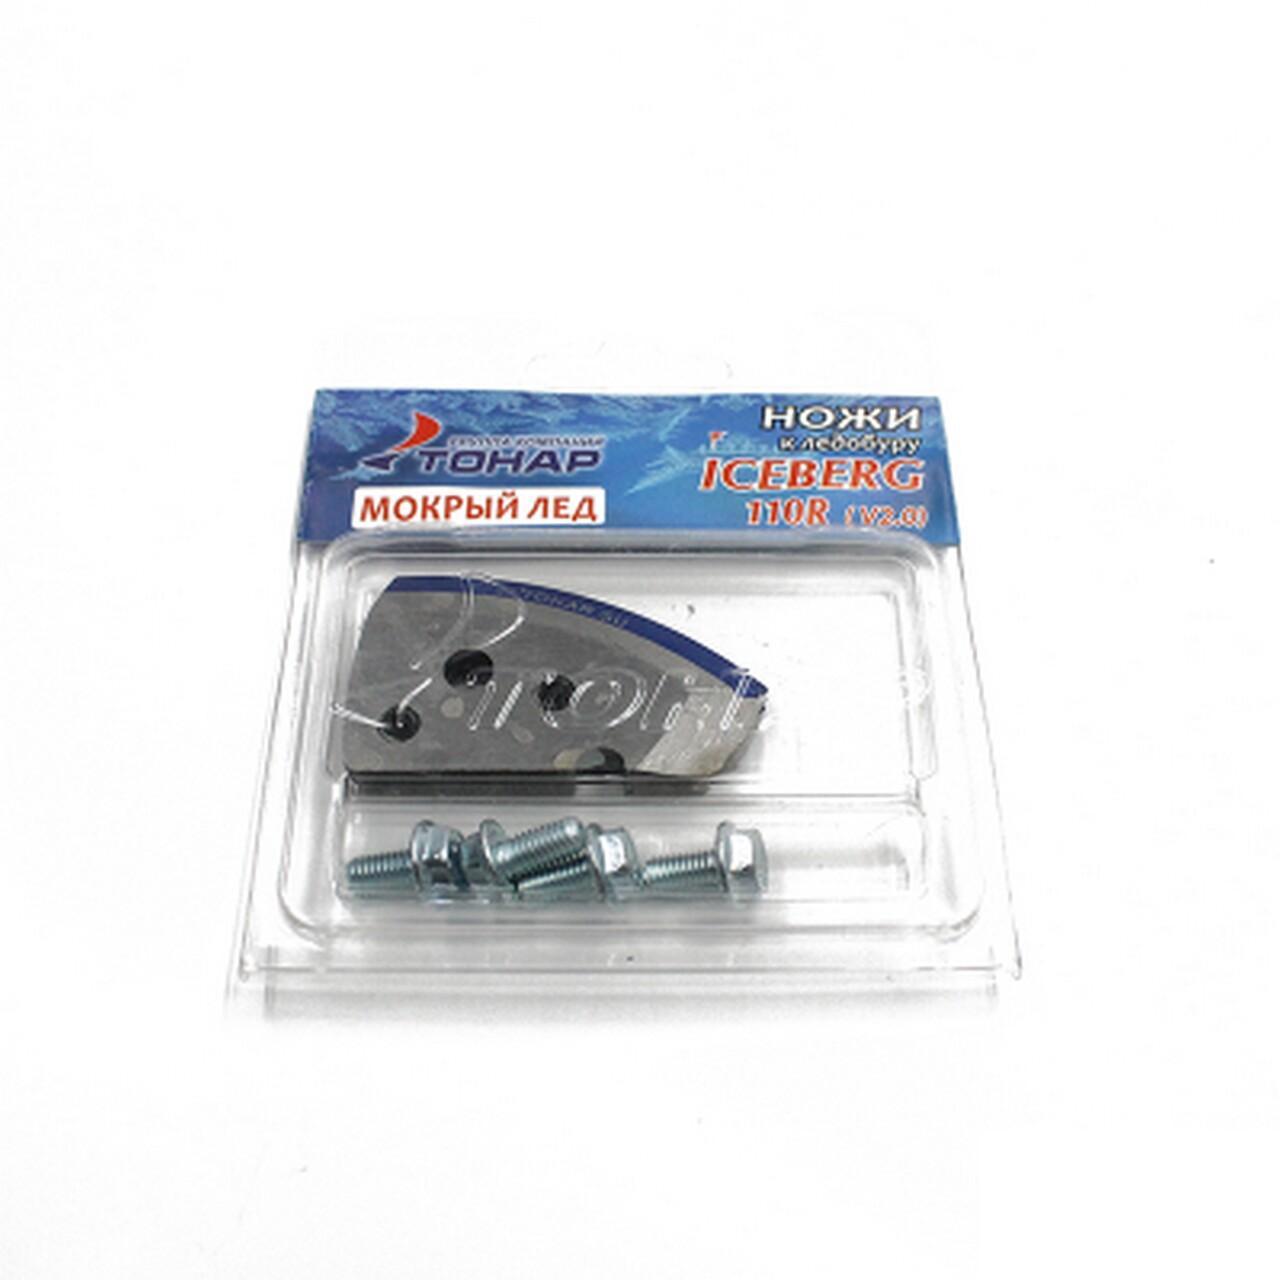 Ножи к ледобуру ICEBERG-110(R) для v2.0/v3.0 (мокрый лед) (ТОНАР)